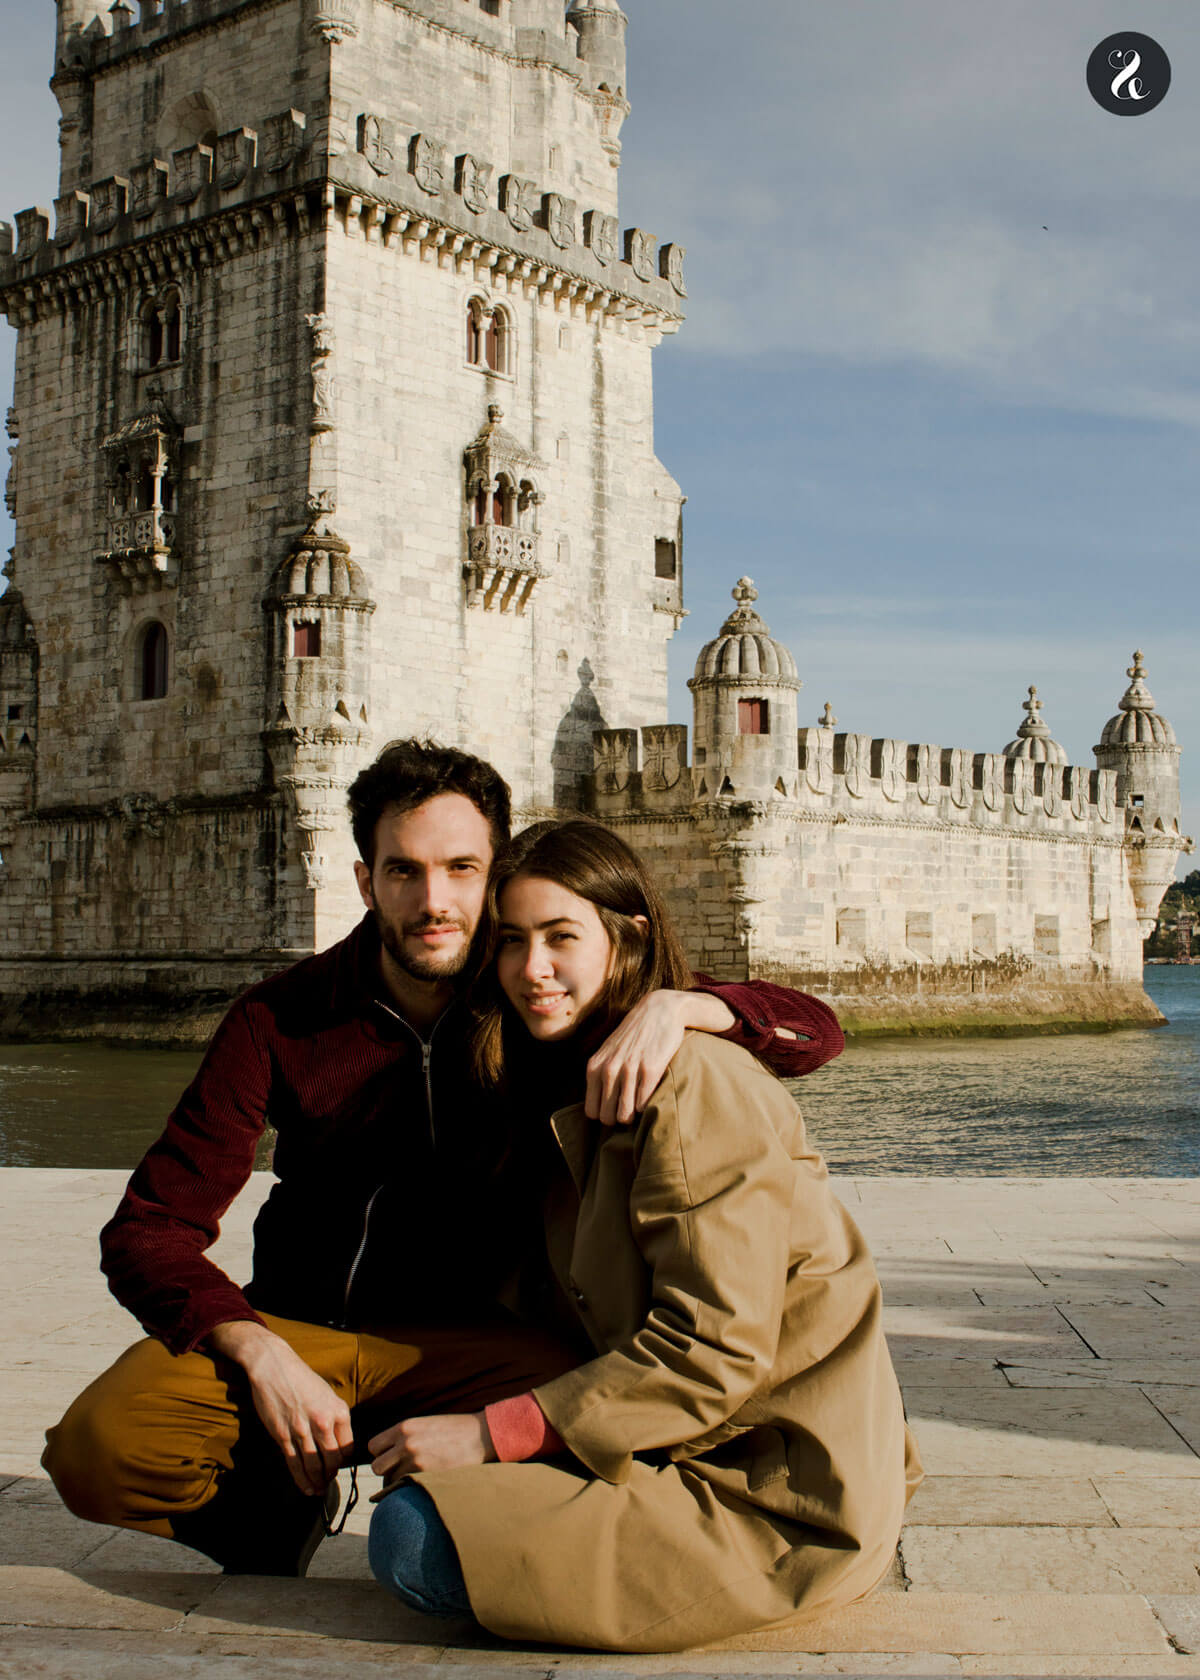 Qué ver en Lisboa - Torre de Belem